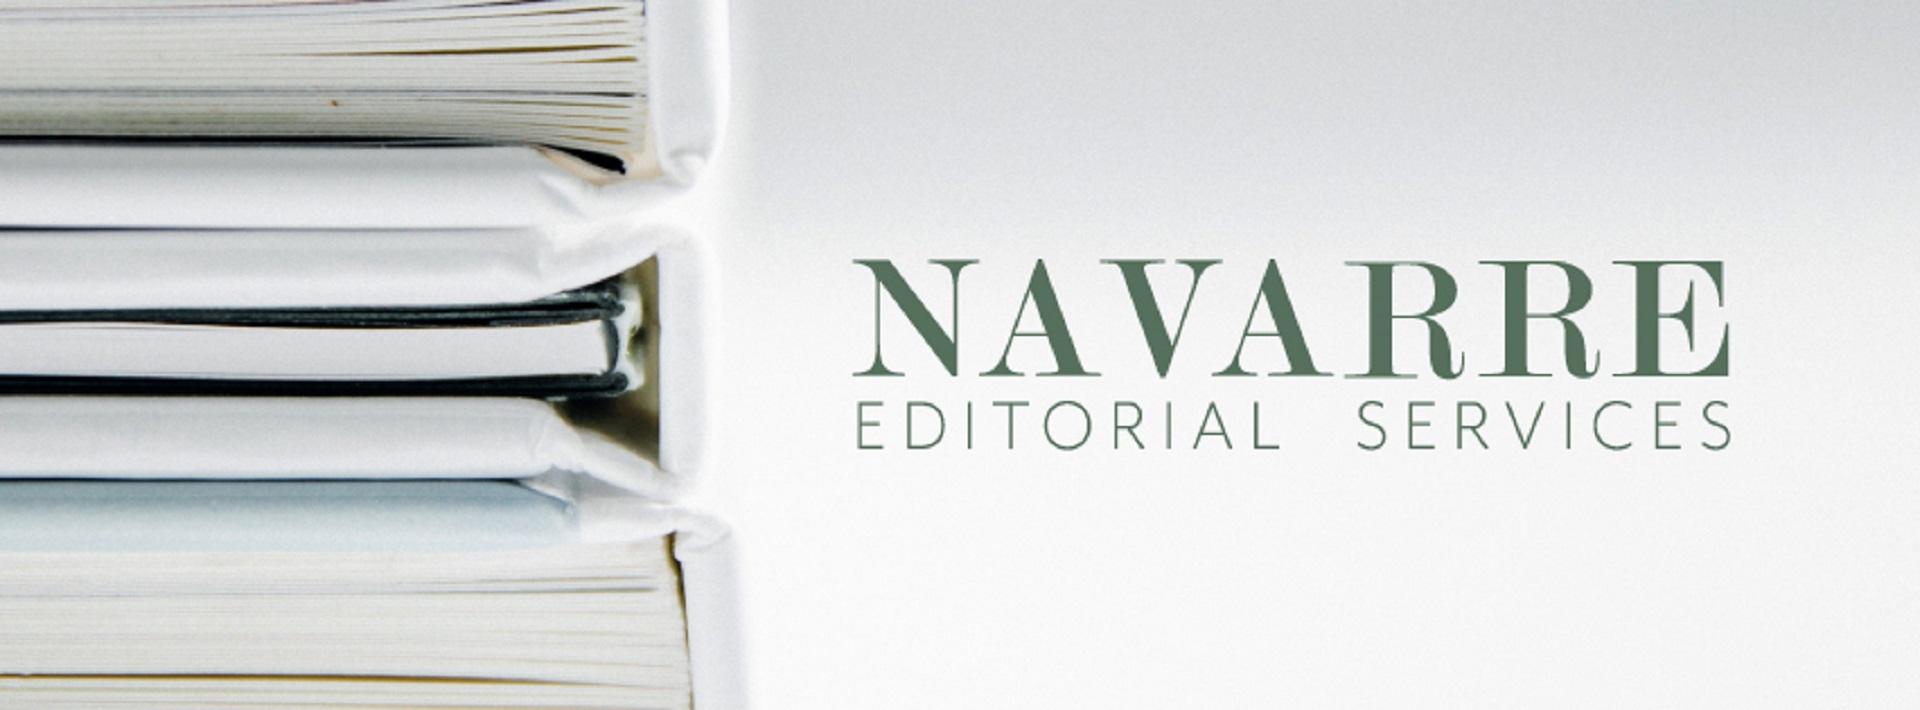 Navarre Editorial Services